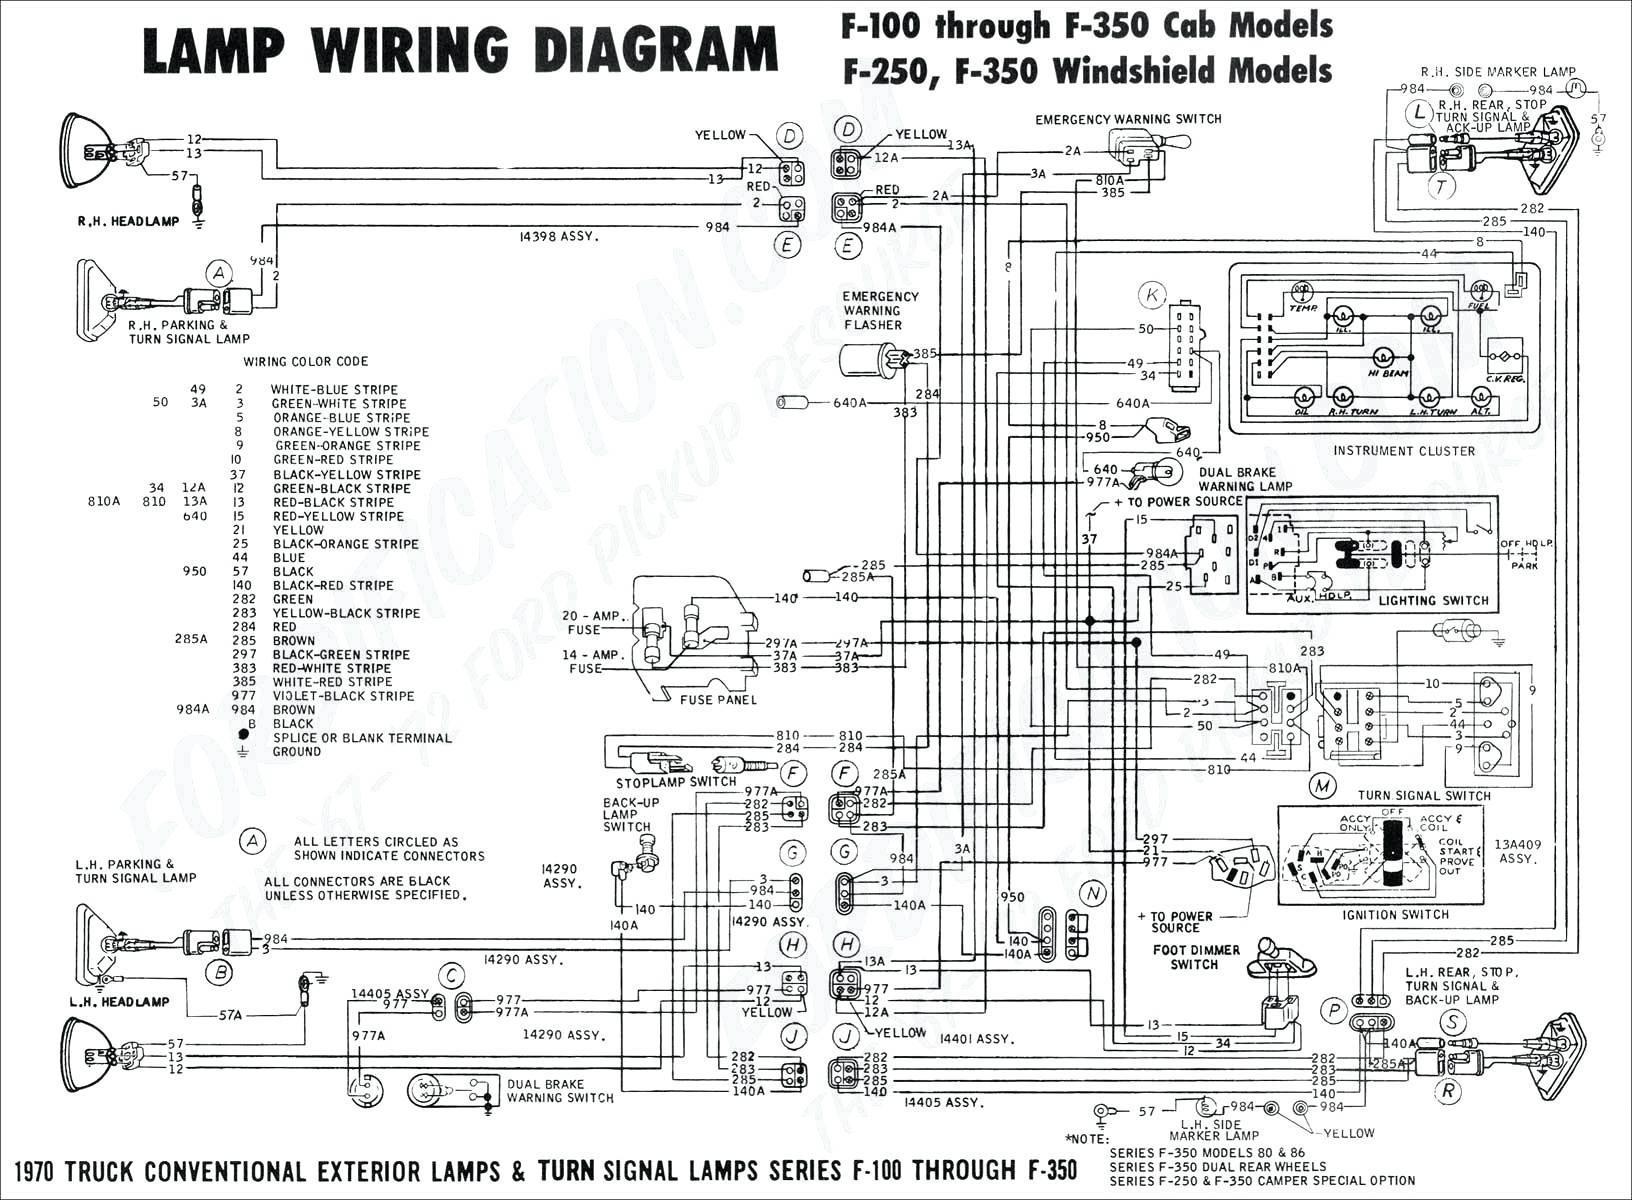 Toyota 22r Engine Diagram toyota Hilux 22r Engine Diagram Wiring Diagram Datasource Of Toyota 22r Engine Diagram toyota Engine Schematics Wiring Diagram Paper